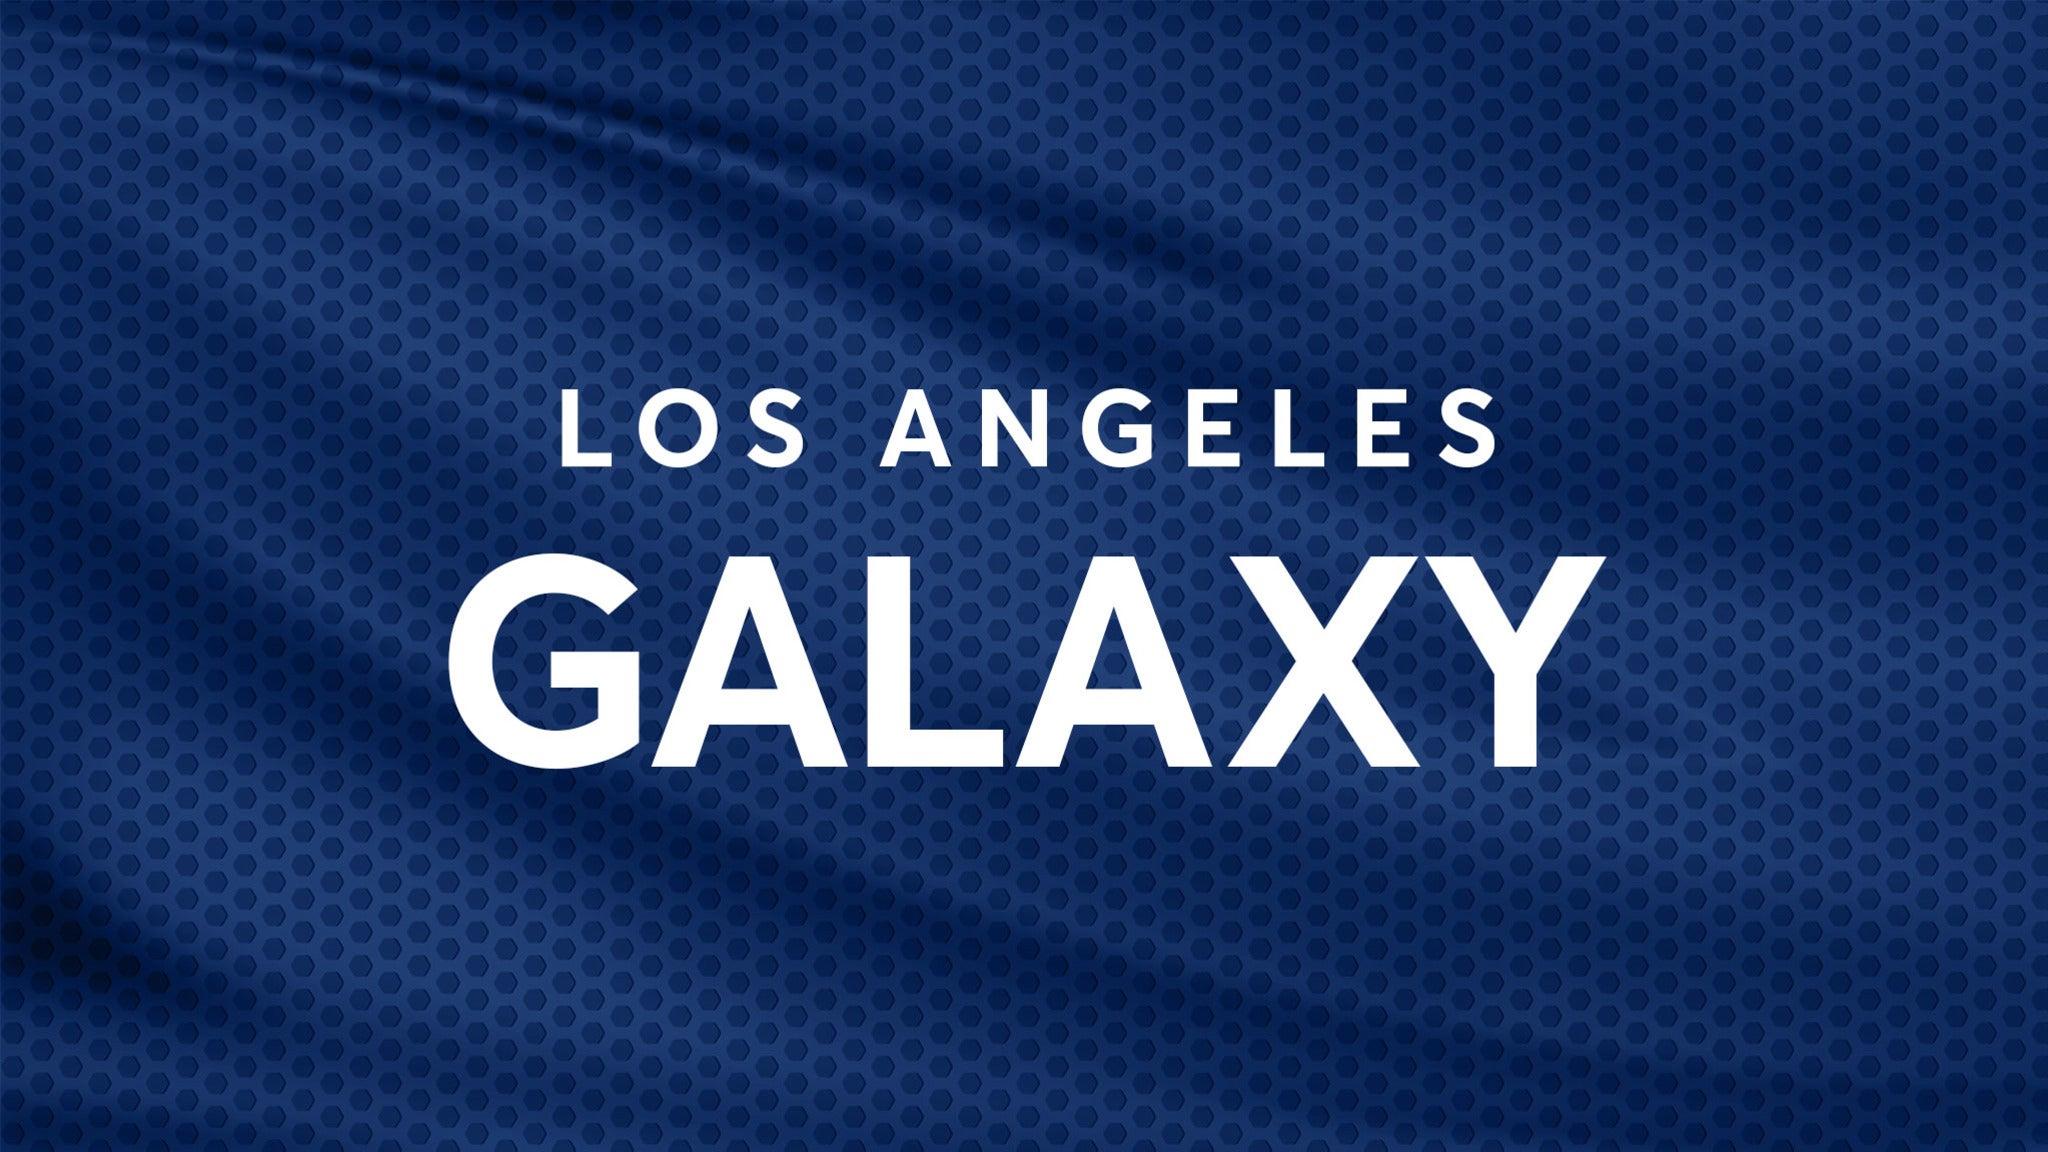 Los Angeles Galaxy vs. Real Salt Lake